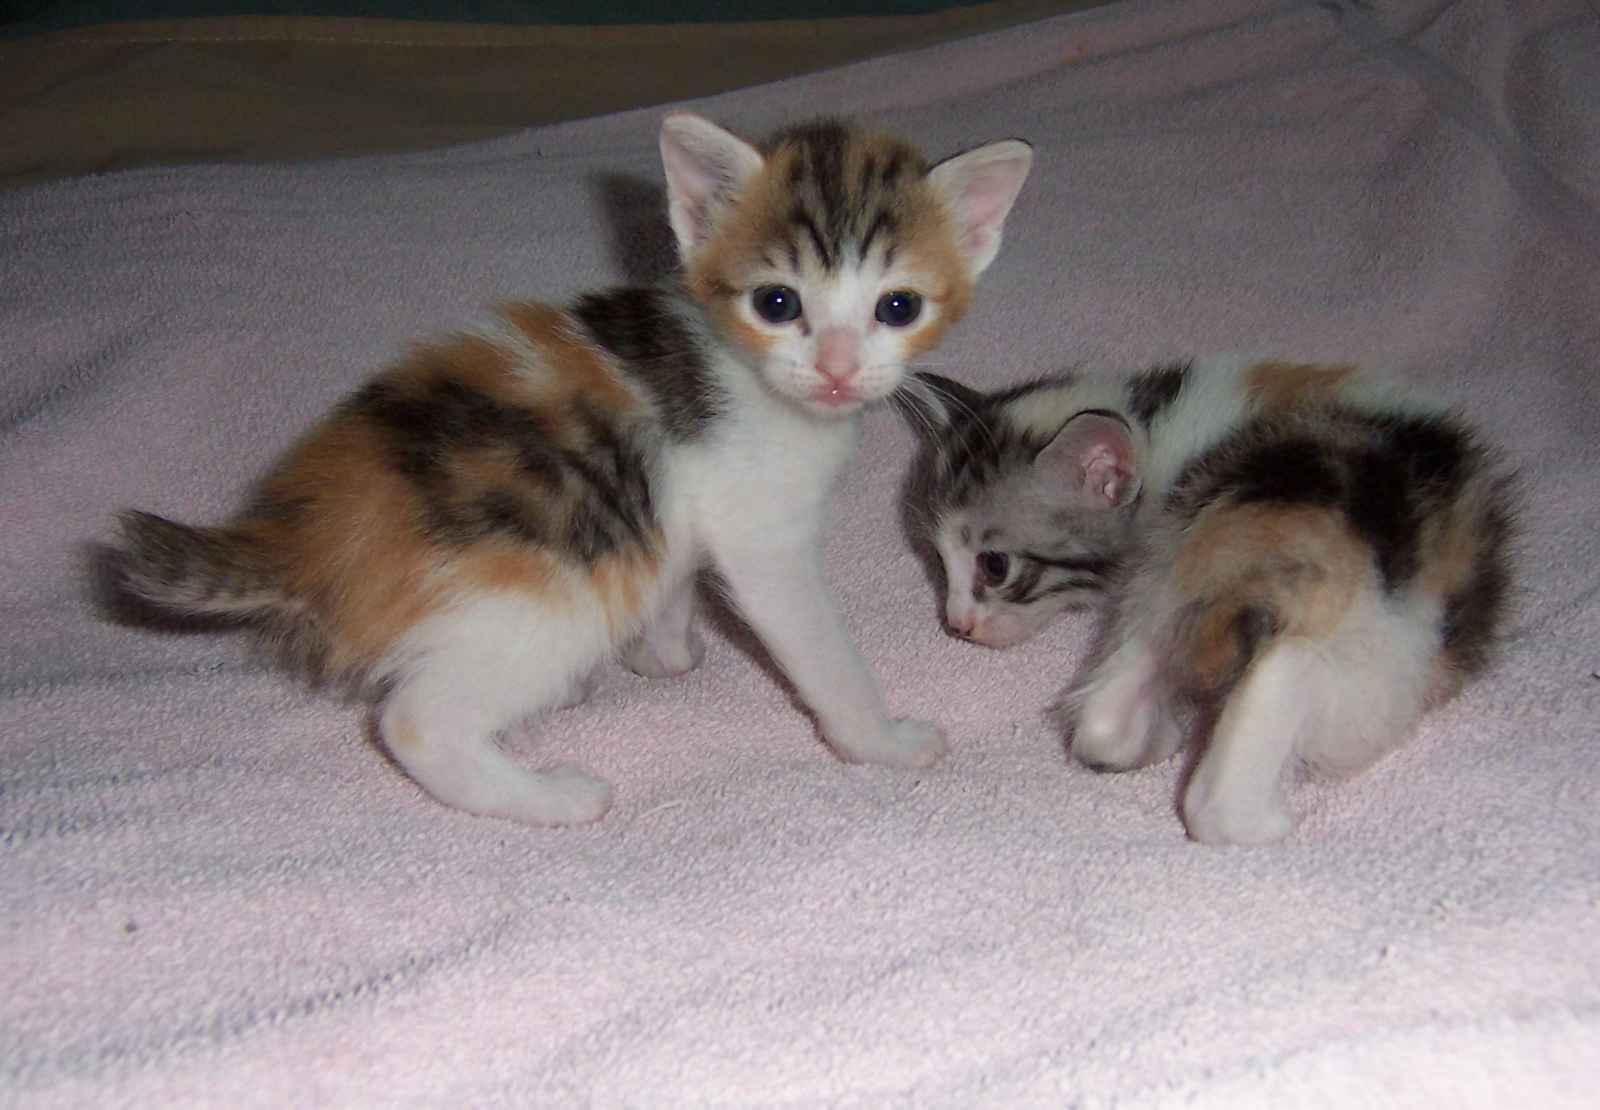 Cute Japanese Bobtail kittens photo and wallpaper Beautiful Cute